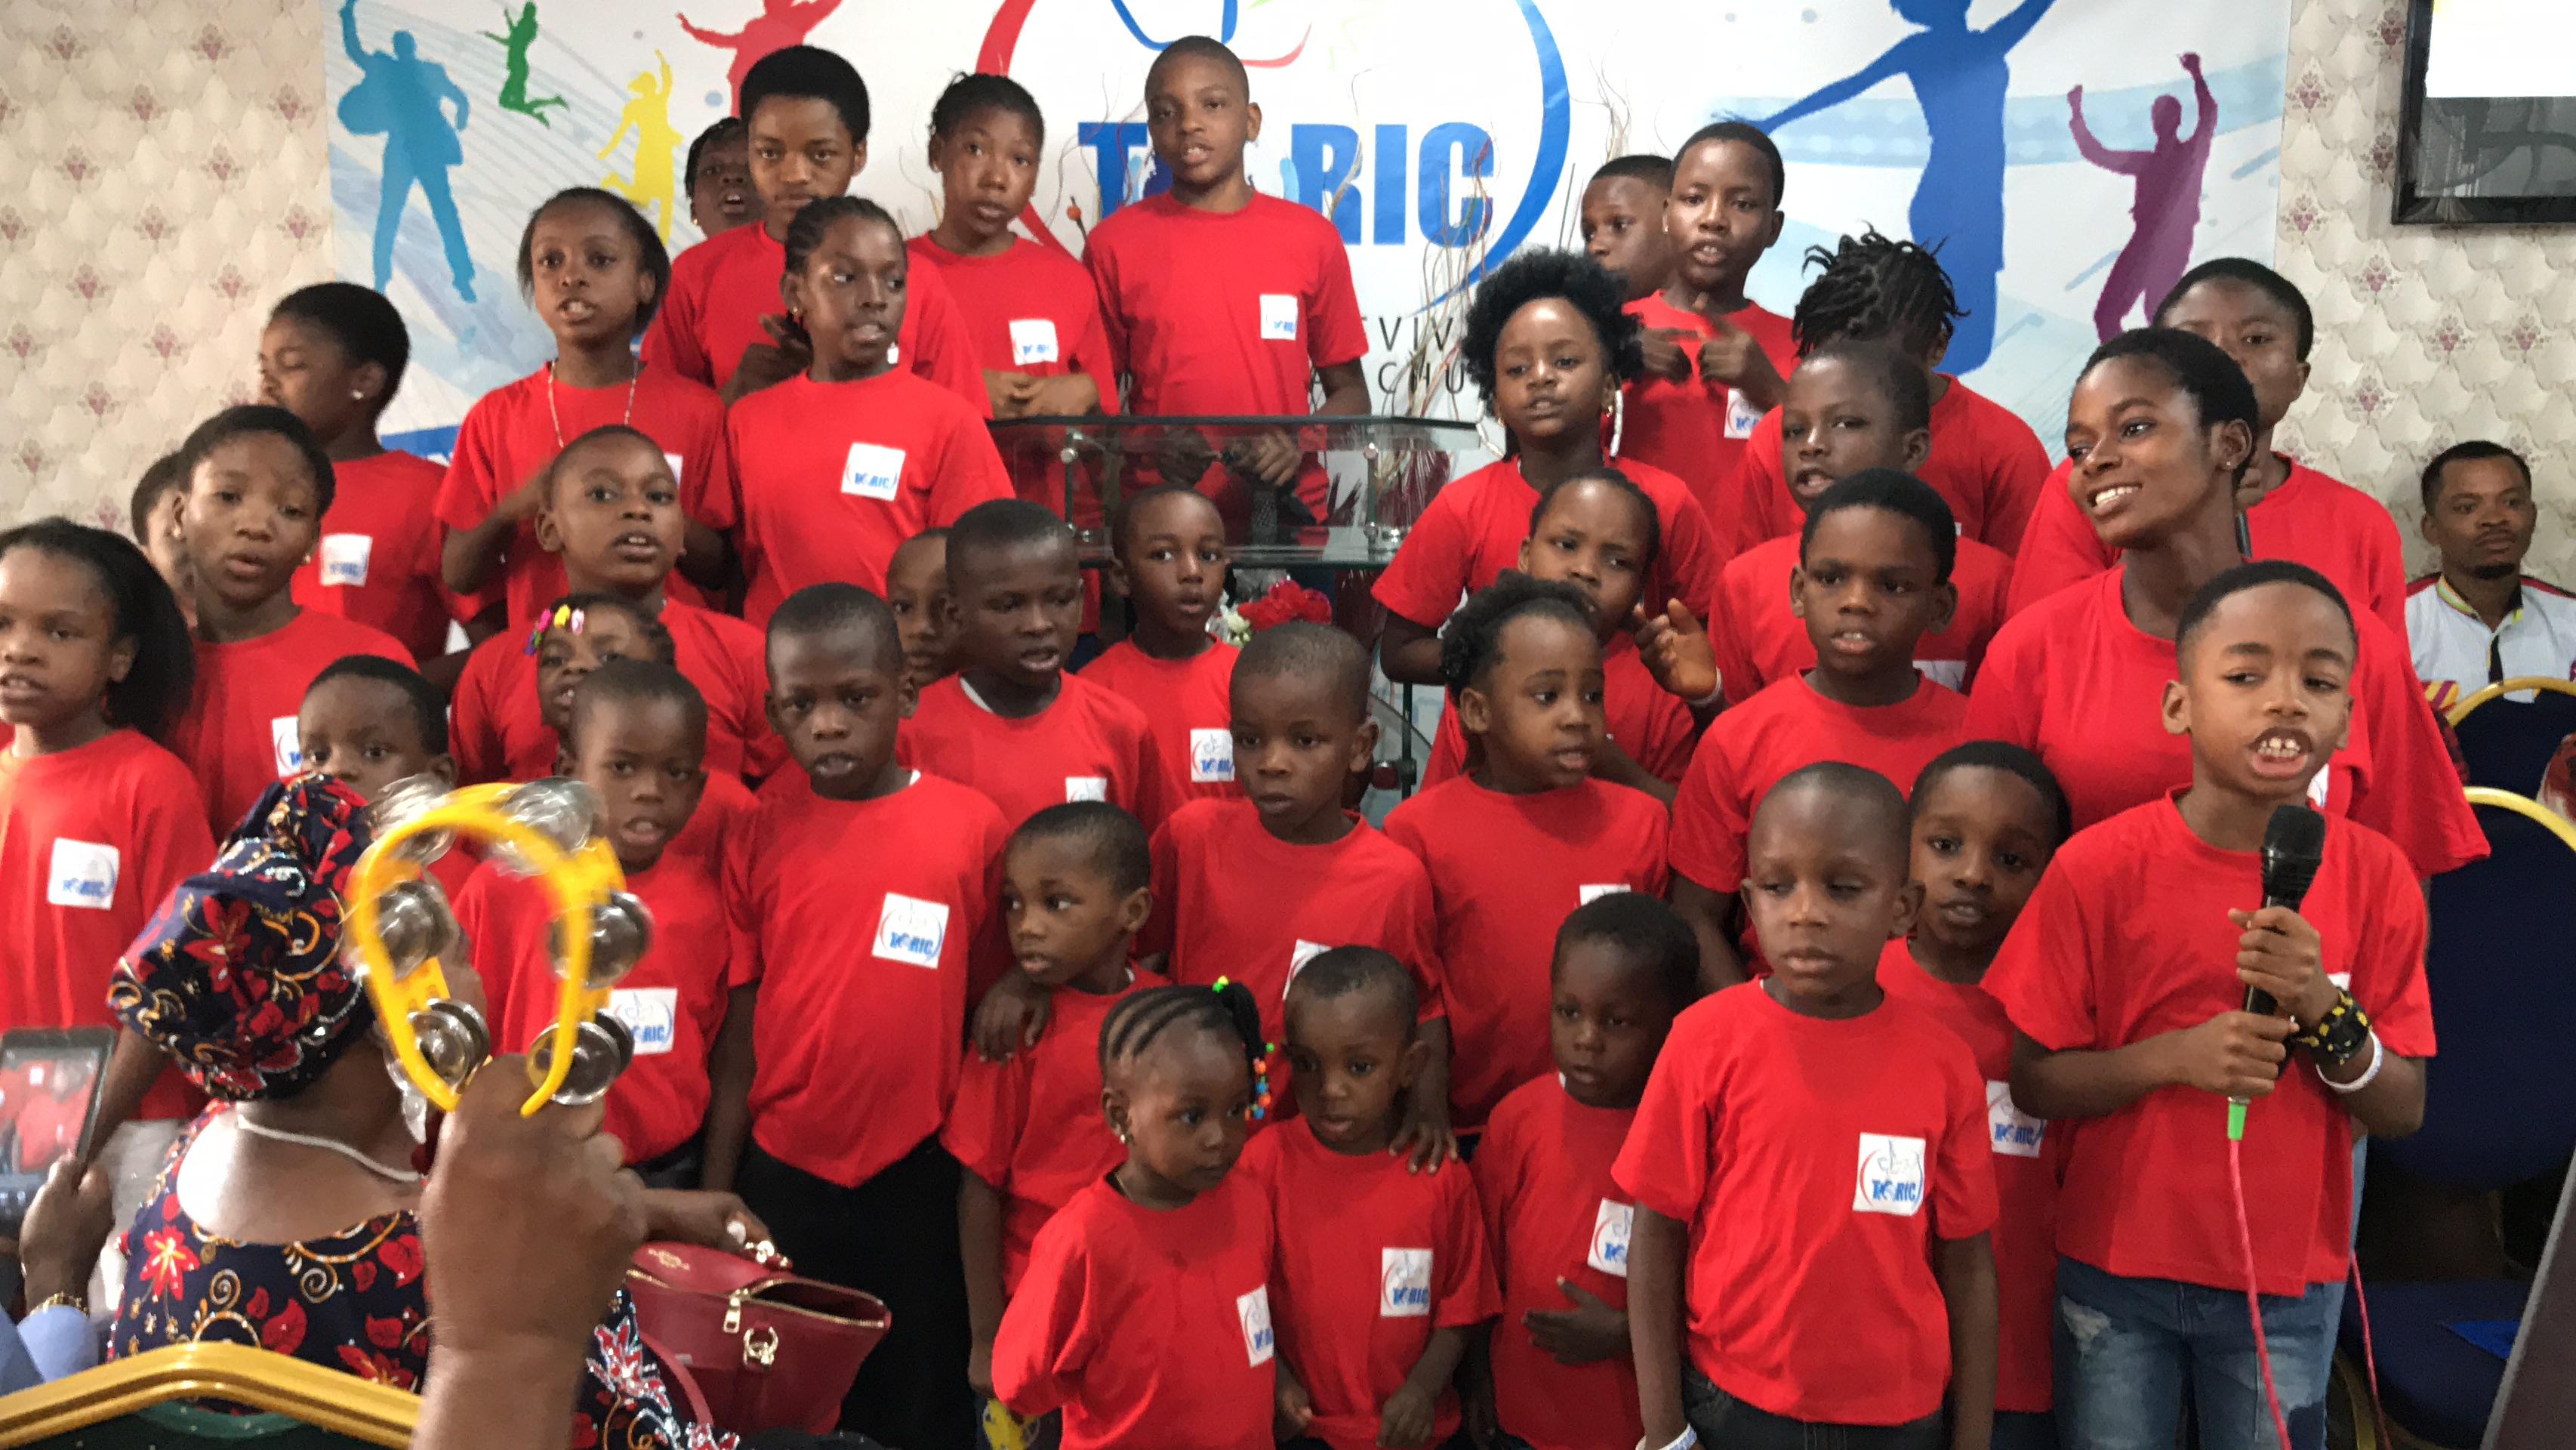 Children's Annual Convention